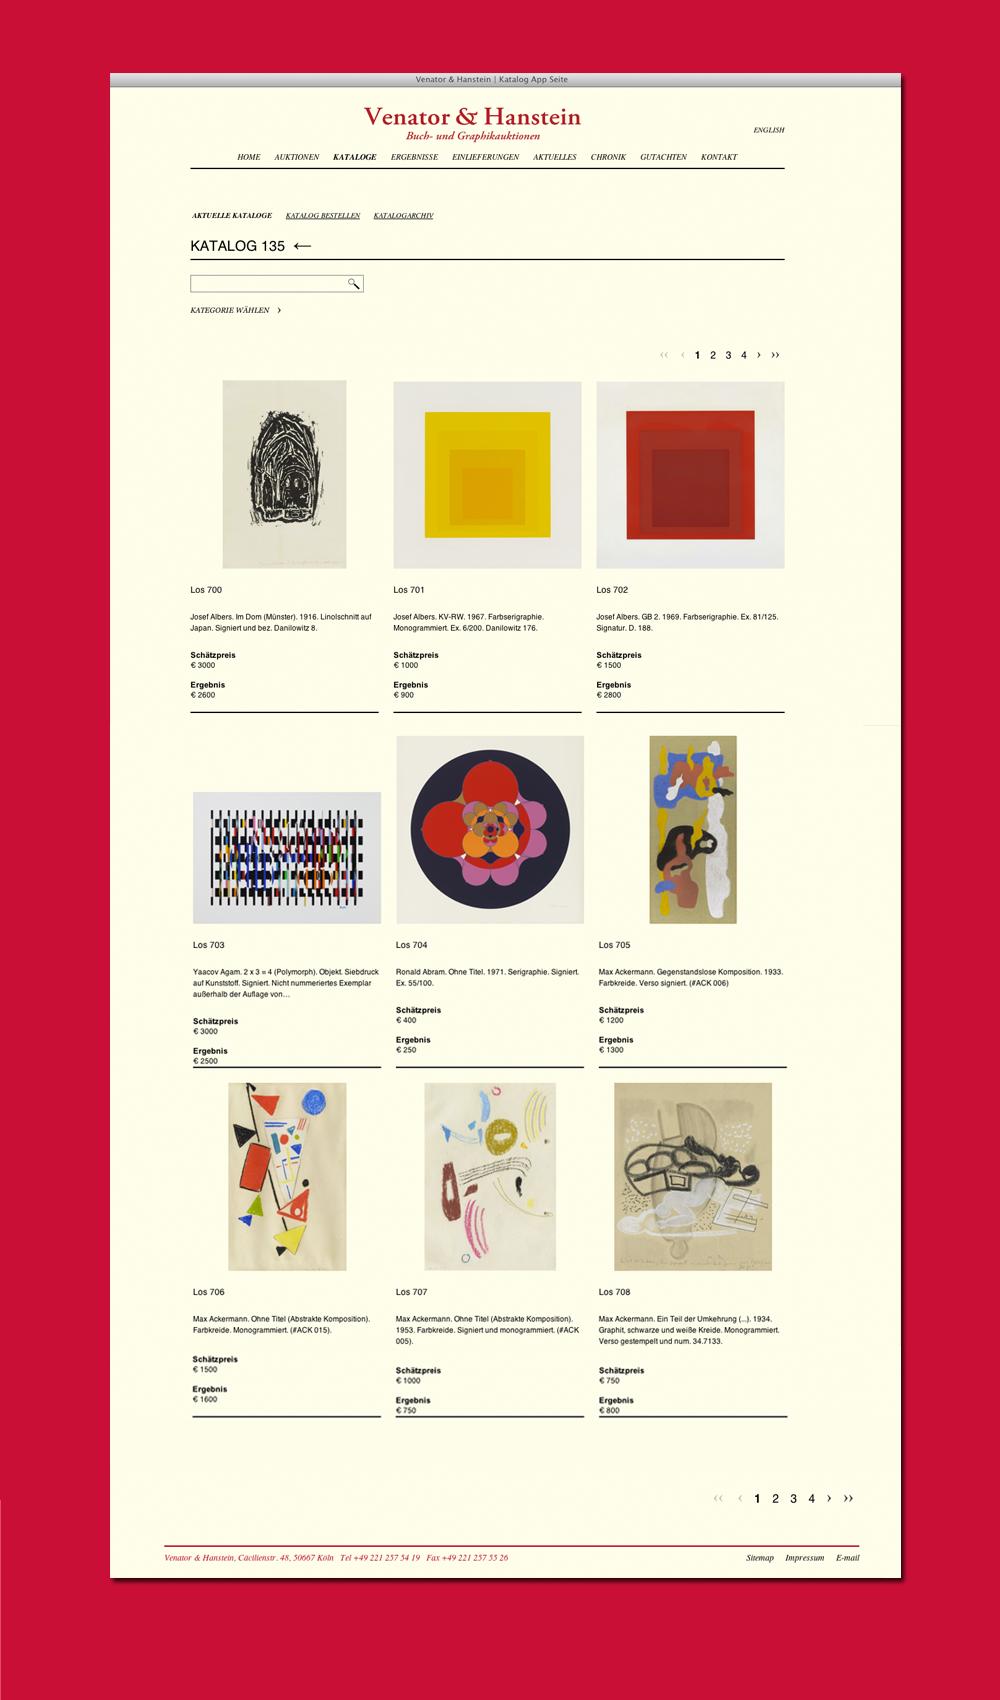 http://www.kaedesign.de/wp-content/uploads/2015/04/Venator_katalog.png